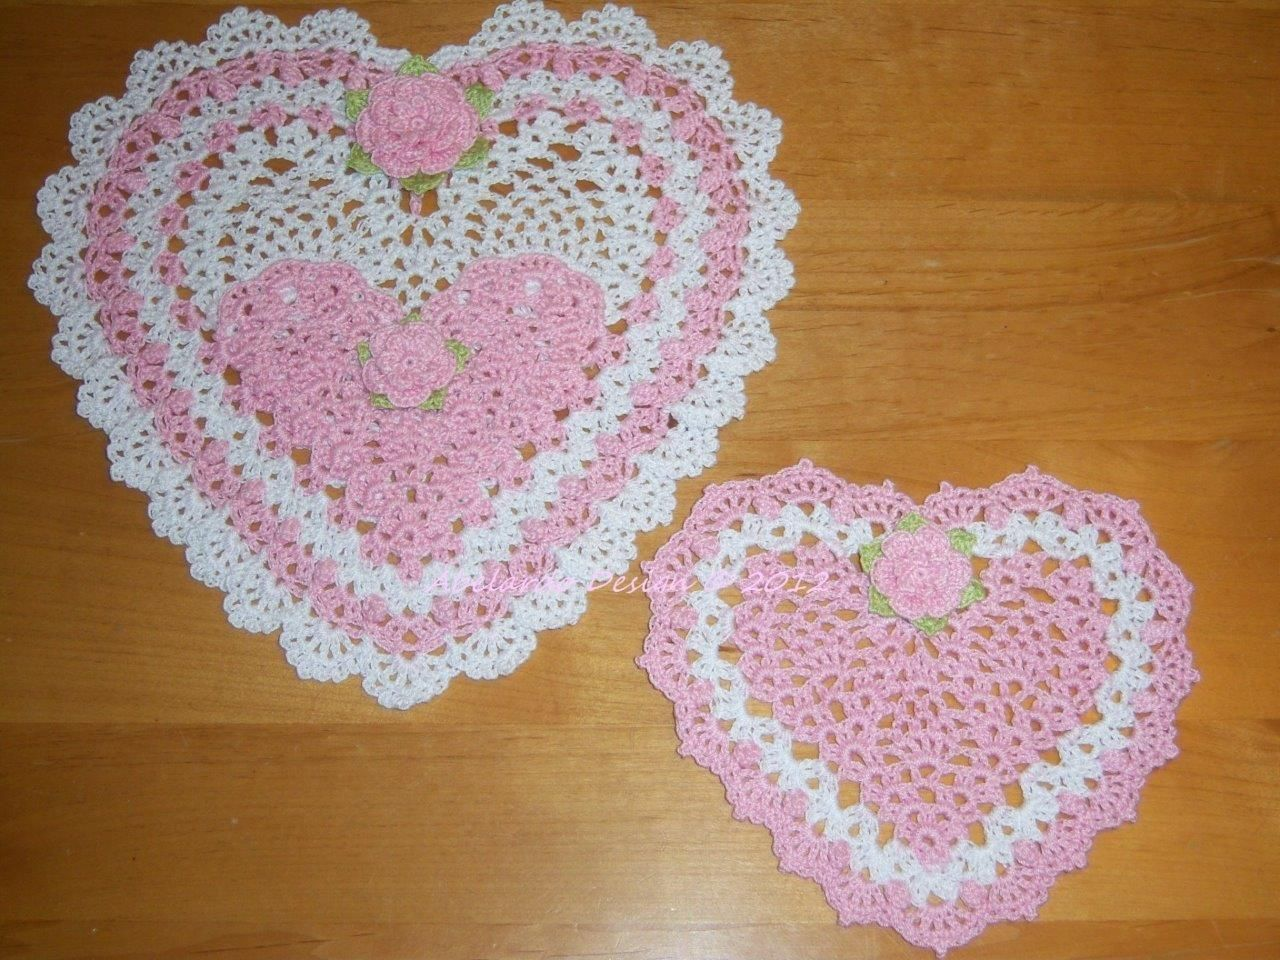 NEW CROCHETED VALENTINE HEART POCKET & HEART W/ ROSES DOILY Set of 2 ...